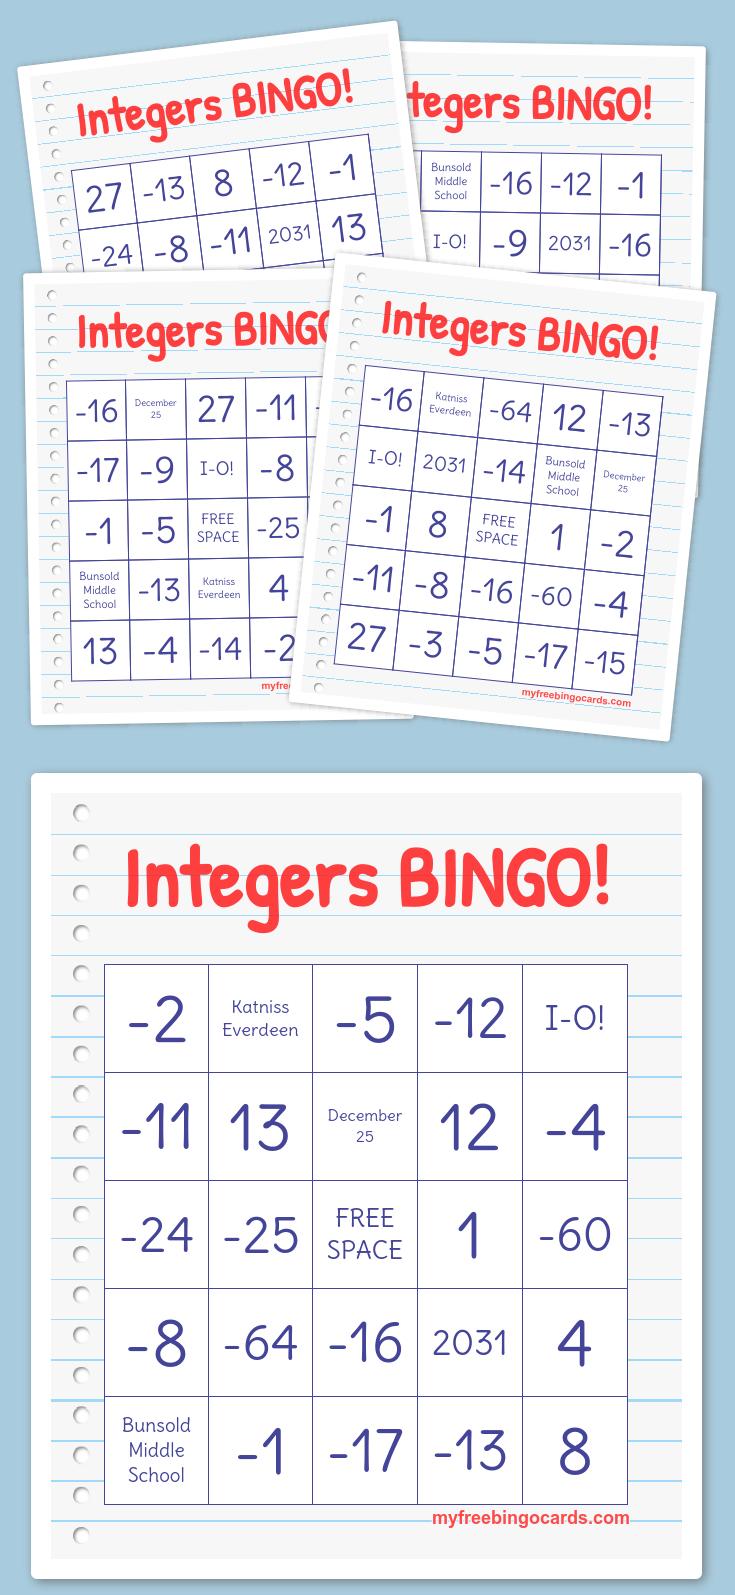 Integers Bingo! | Free Bingo Cards, Bingo Card Generator